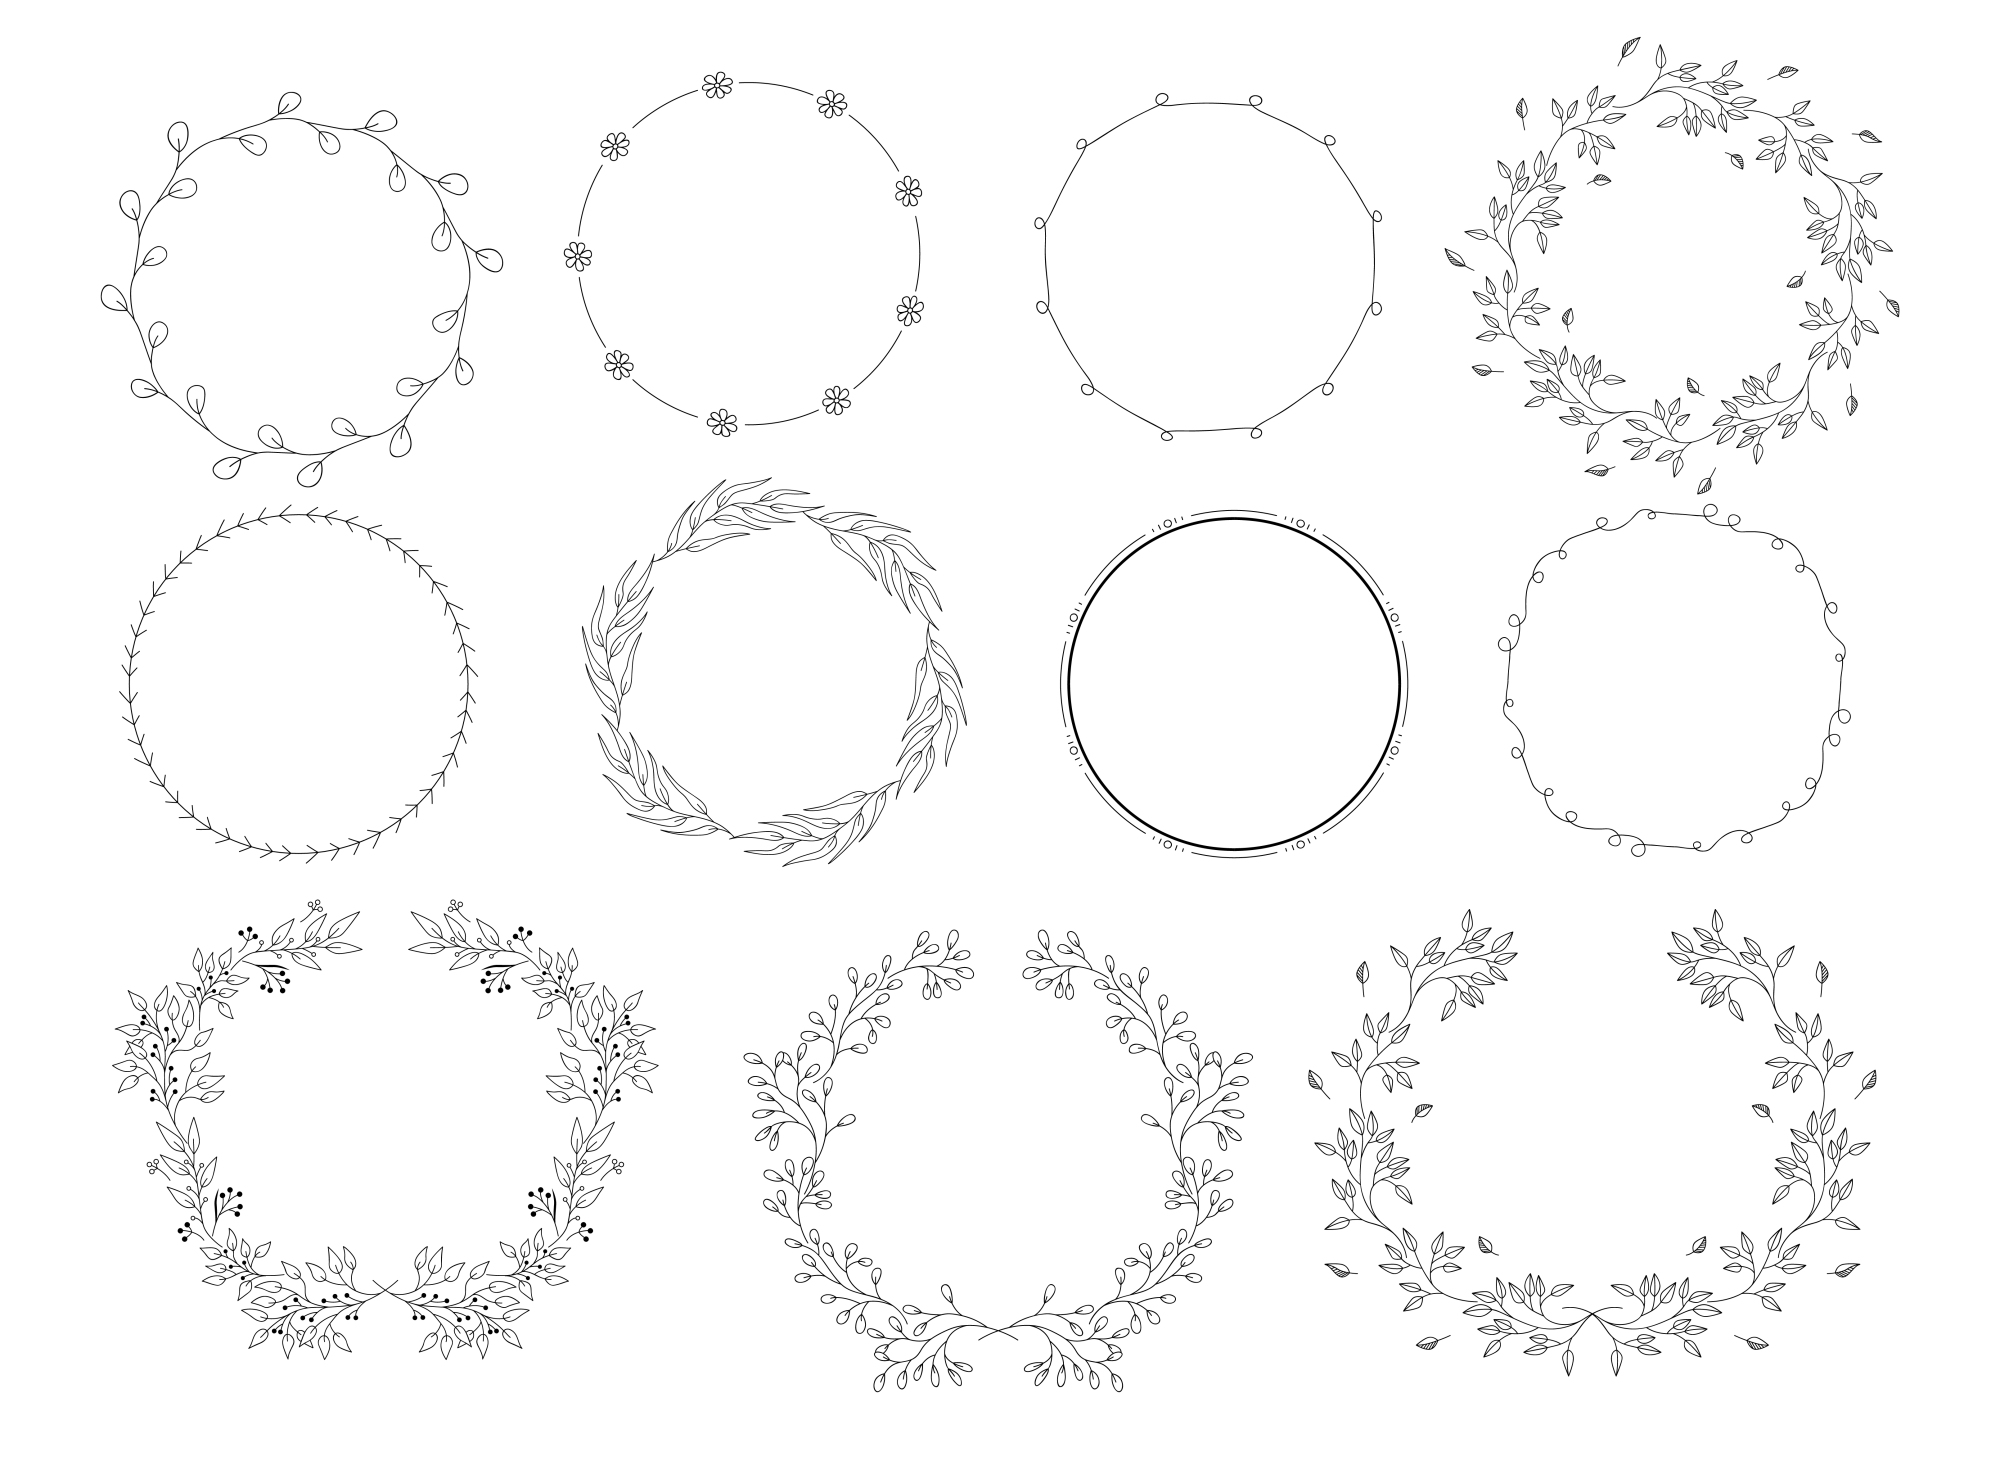 450 handsketched elements. Nature mega pack example image 18